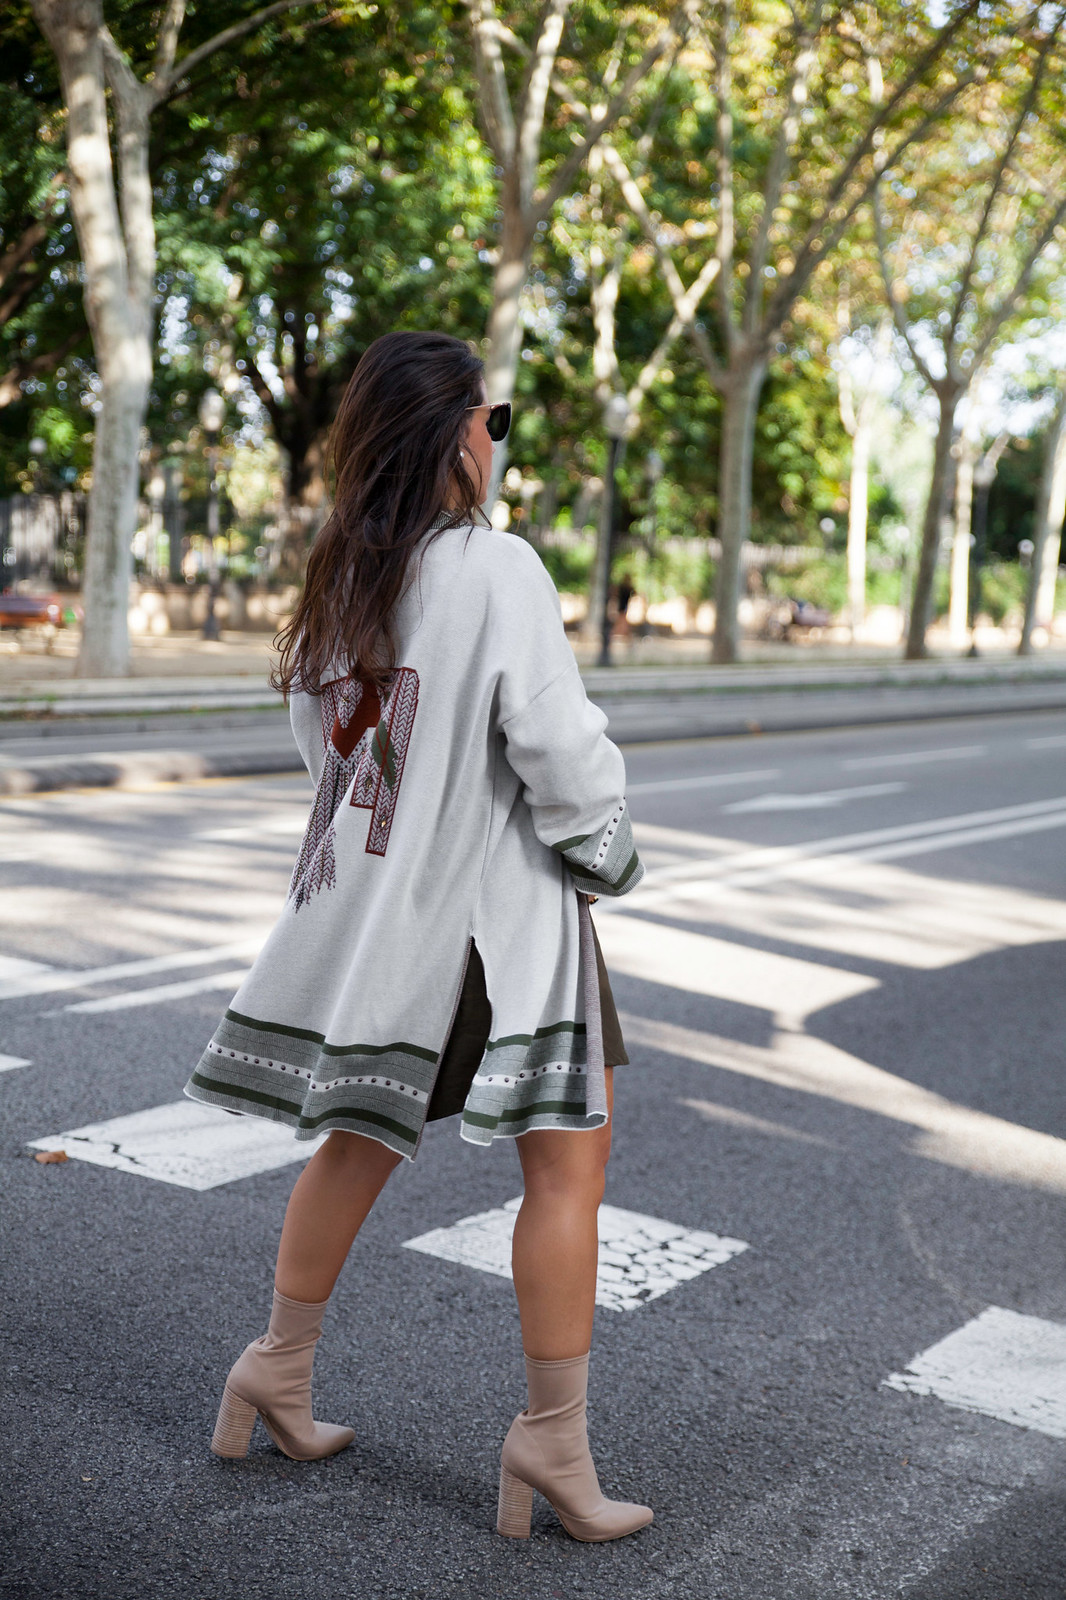 010_Como_combinar_un_cardigan_khaki_etnico_otoño_theguestgirl_rüga_laura_santolaira_influencer_embarazada_fashion_street_style_barcelona